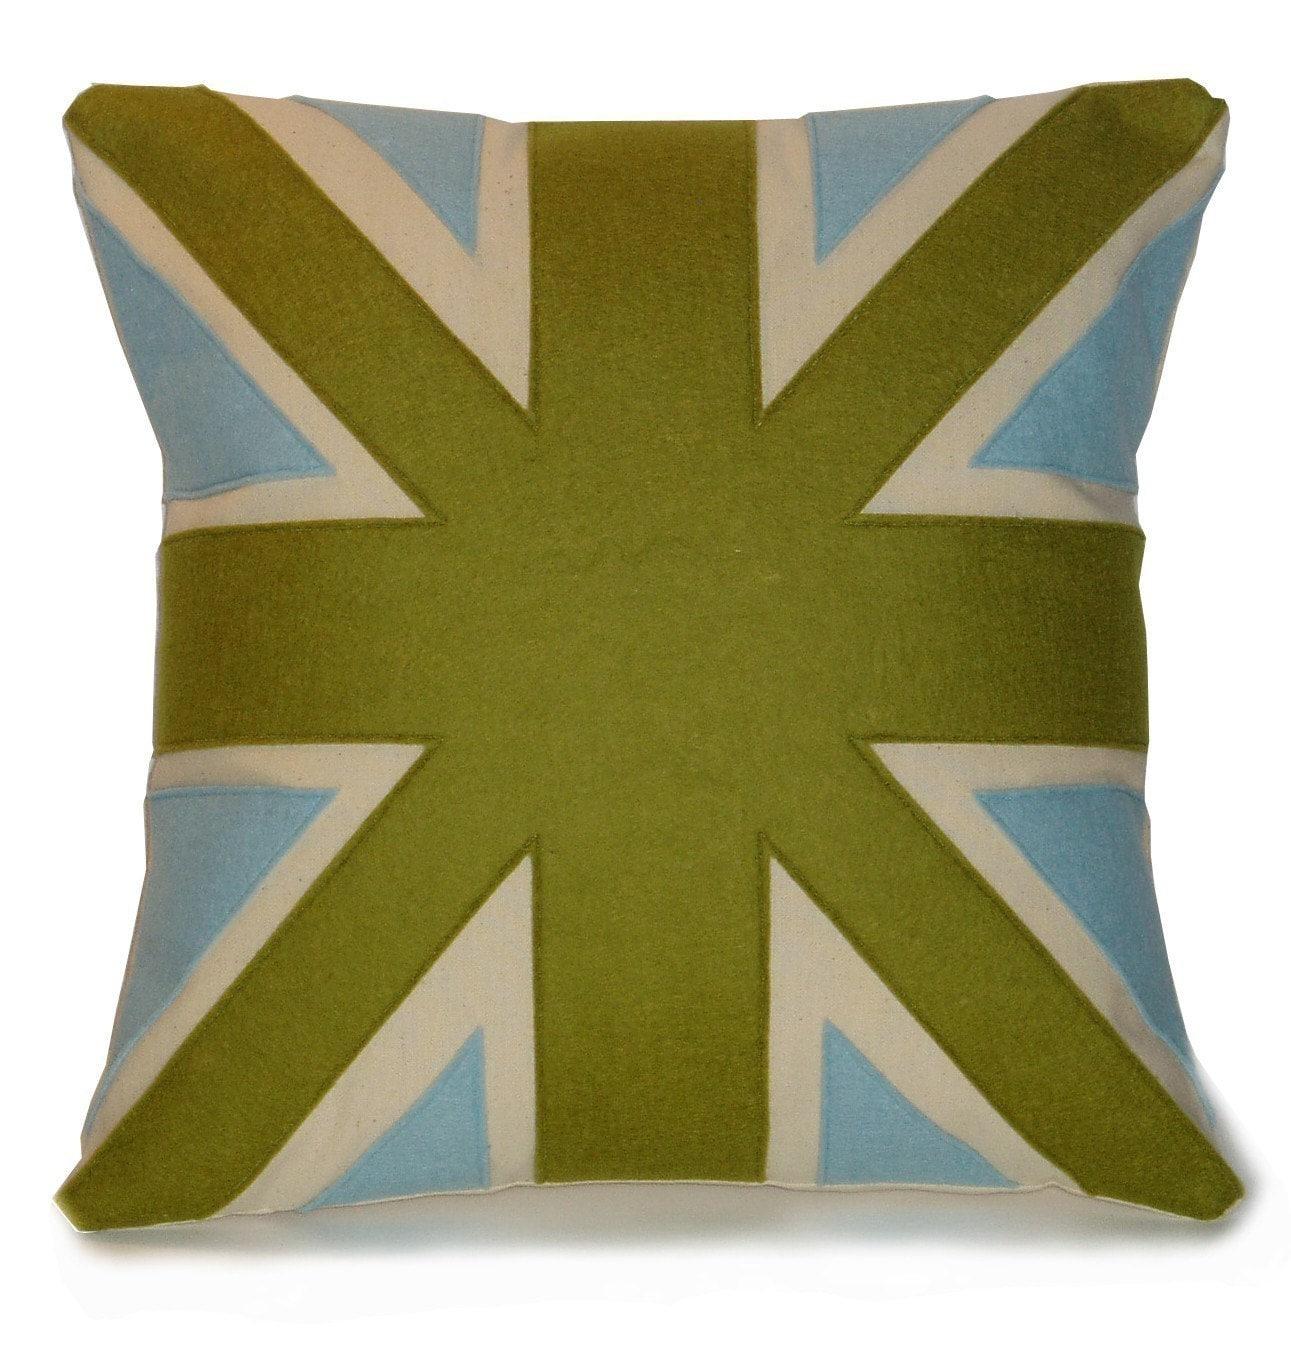 green and light blue UNION JACK CUSHION